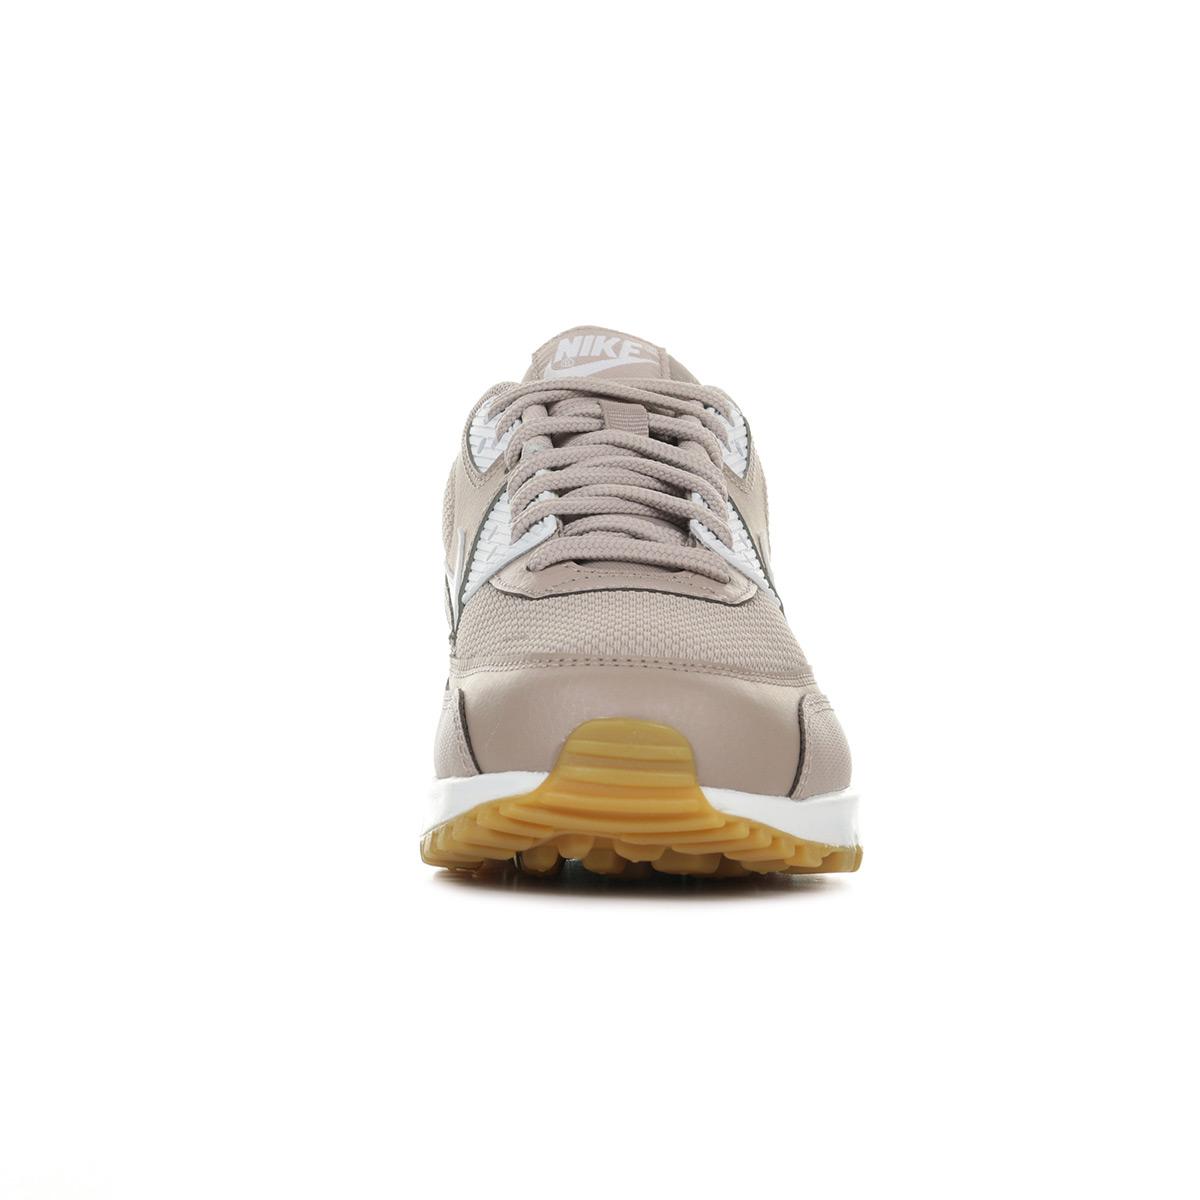 separation shoes 62042 ad4e8 Nike Wmns Air Max 90